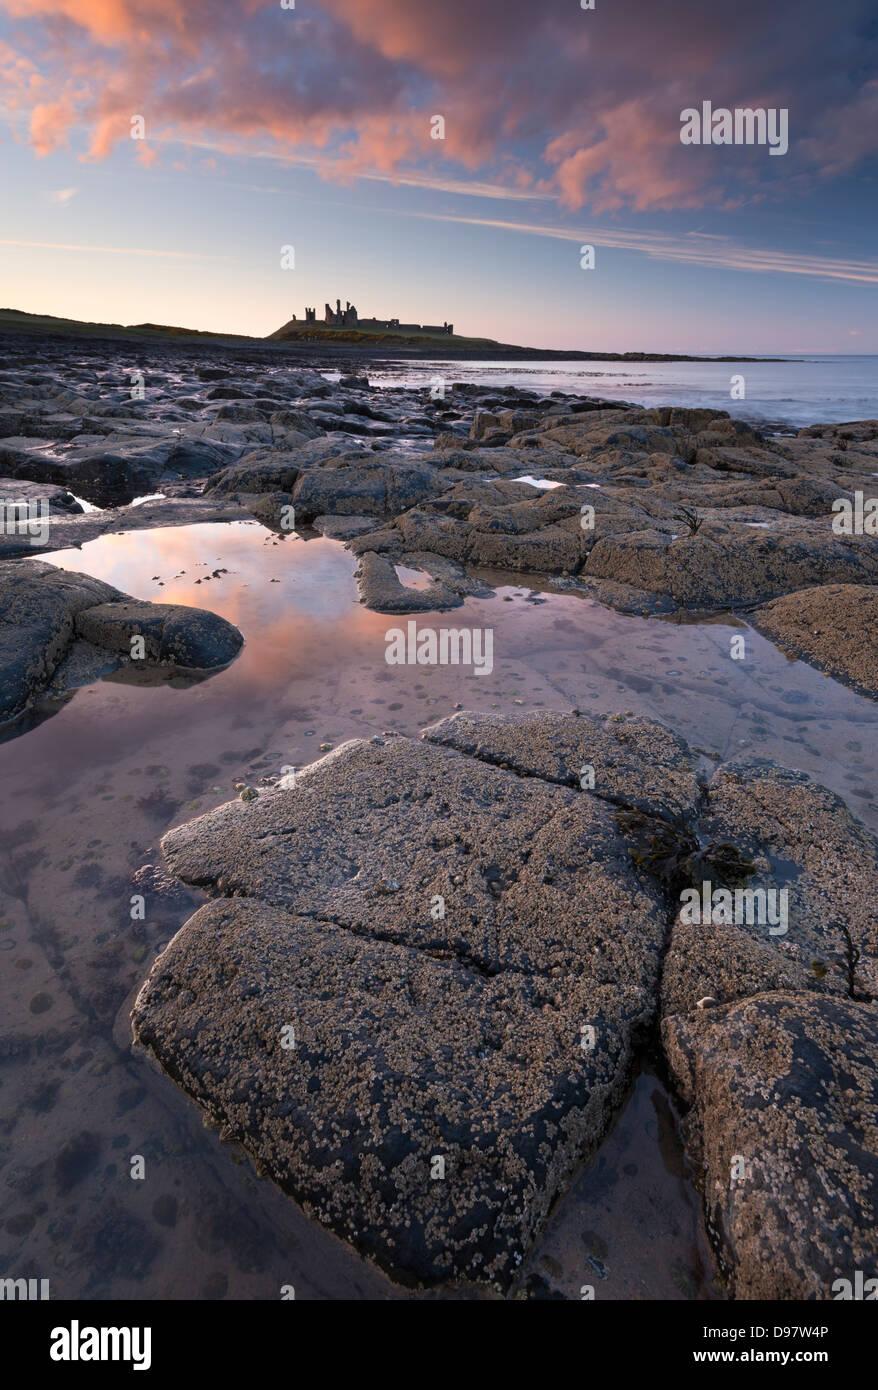 Sonnenuntergang über Dunstanburgh Castle in Northumberland, England. Frühjahr 2013 (Mai). Stockbild